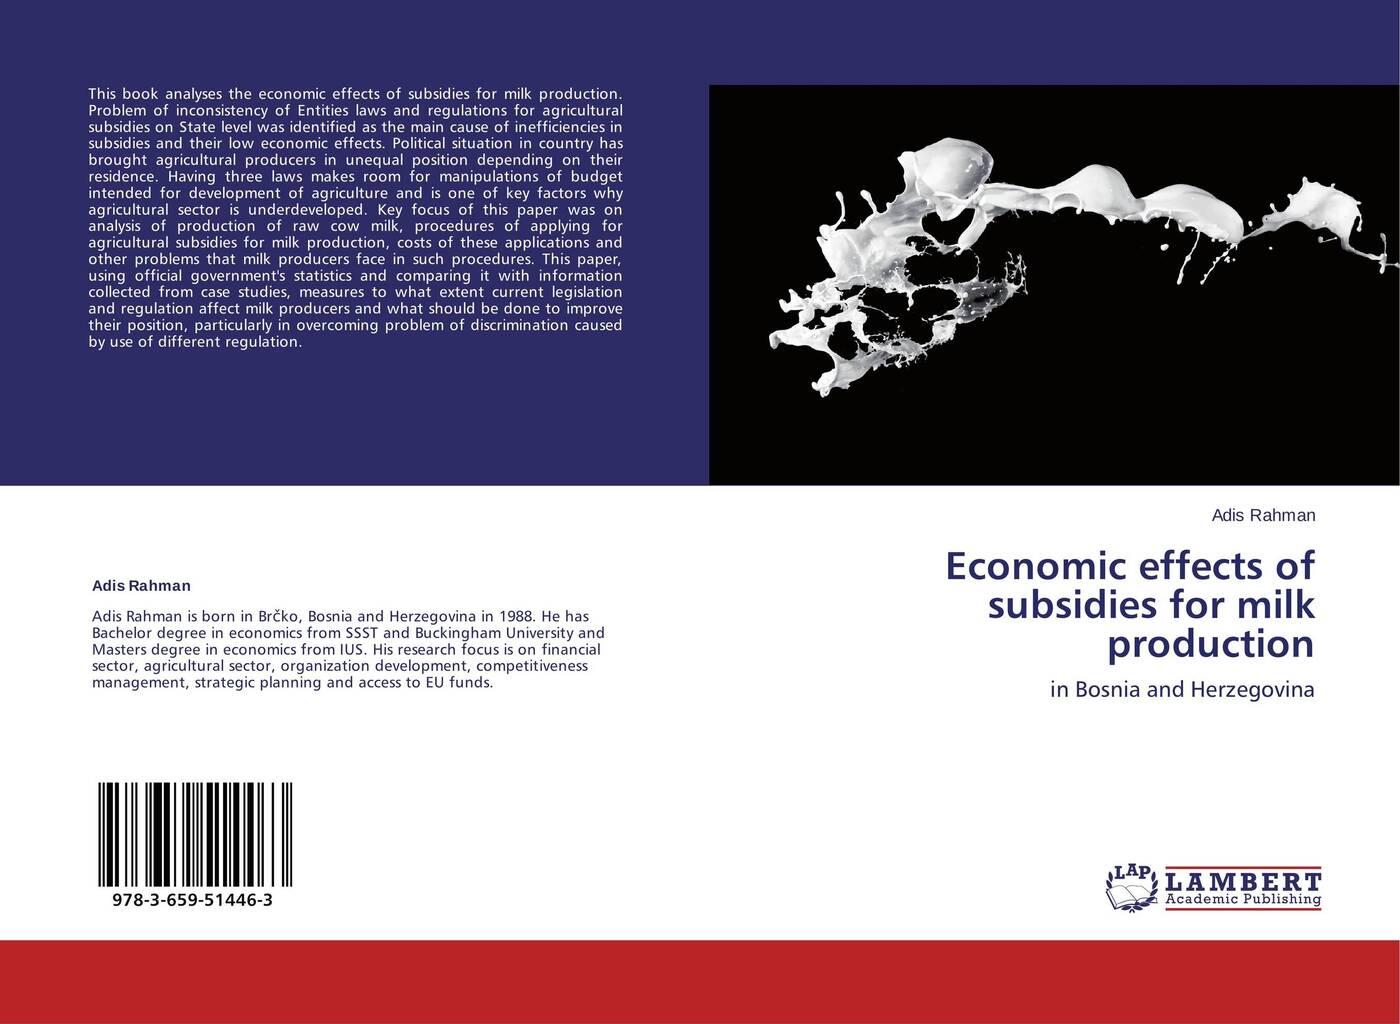 Adis Rahman Economic effects of subsidies for milk production цена в Москве и Питере